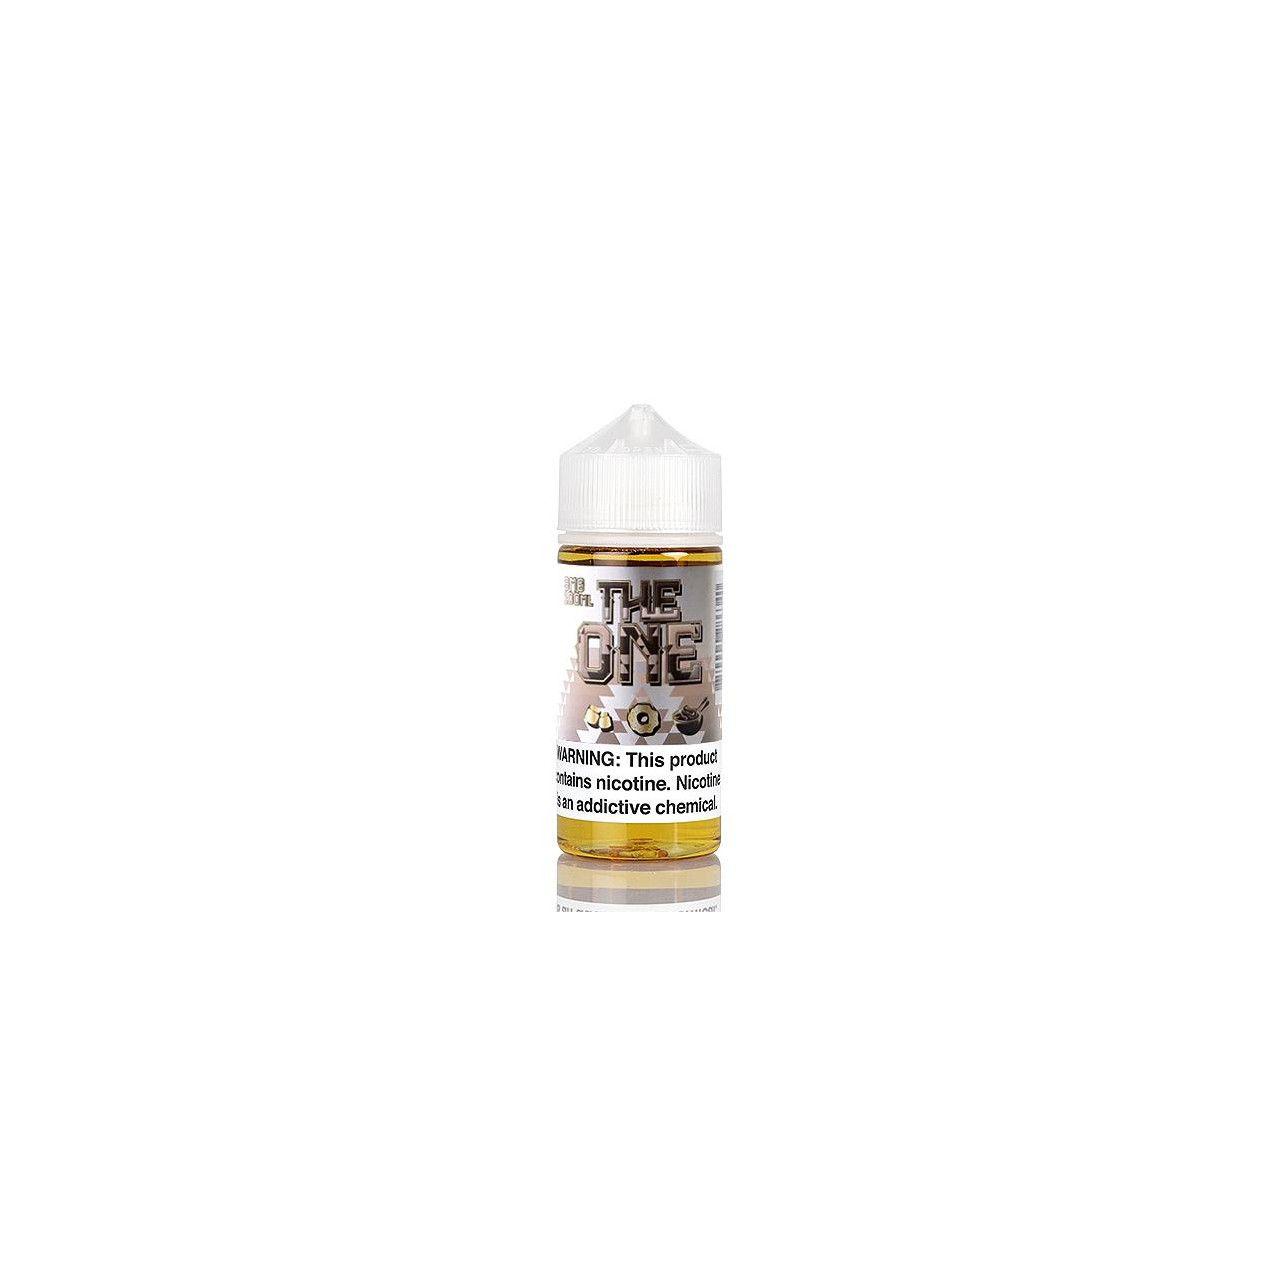 Líquido (Juice) - Beard Vape Co - The One - Marshmallow Milk Beard CO. - 1